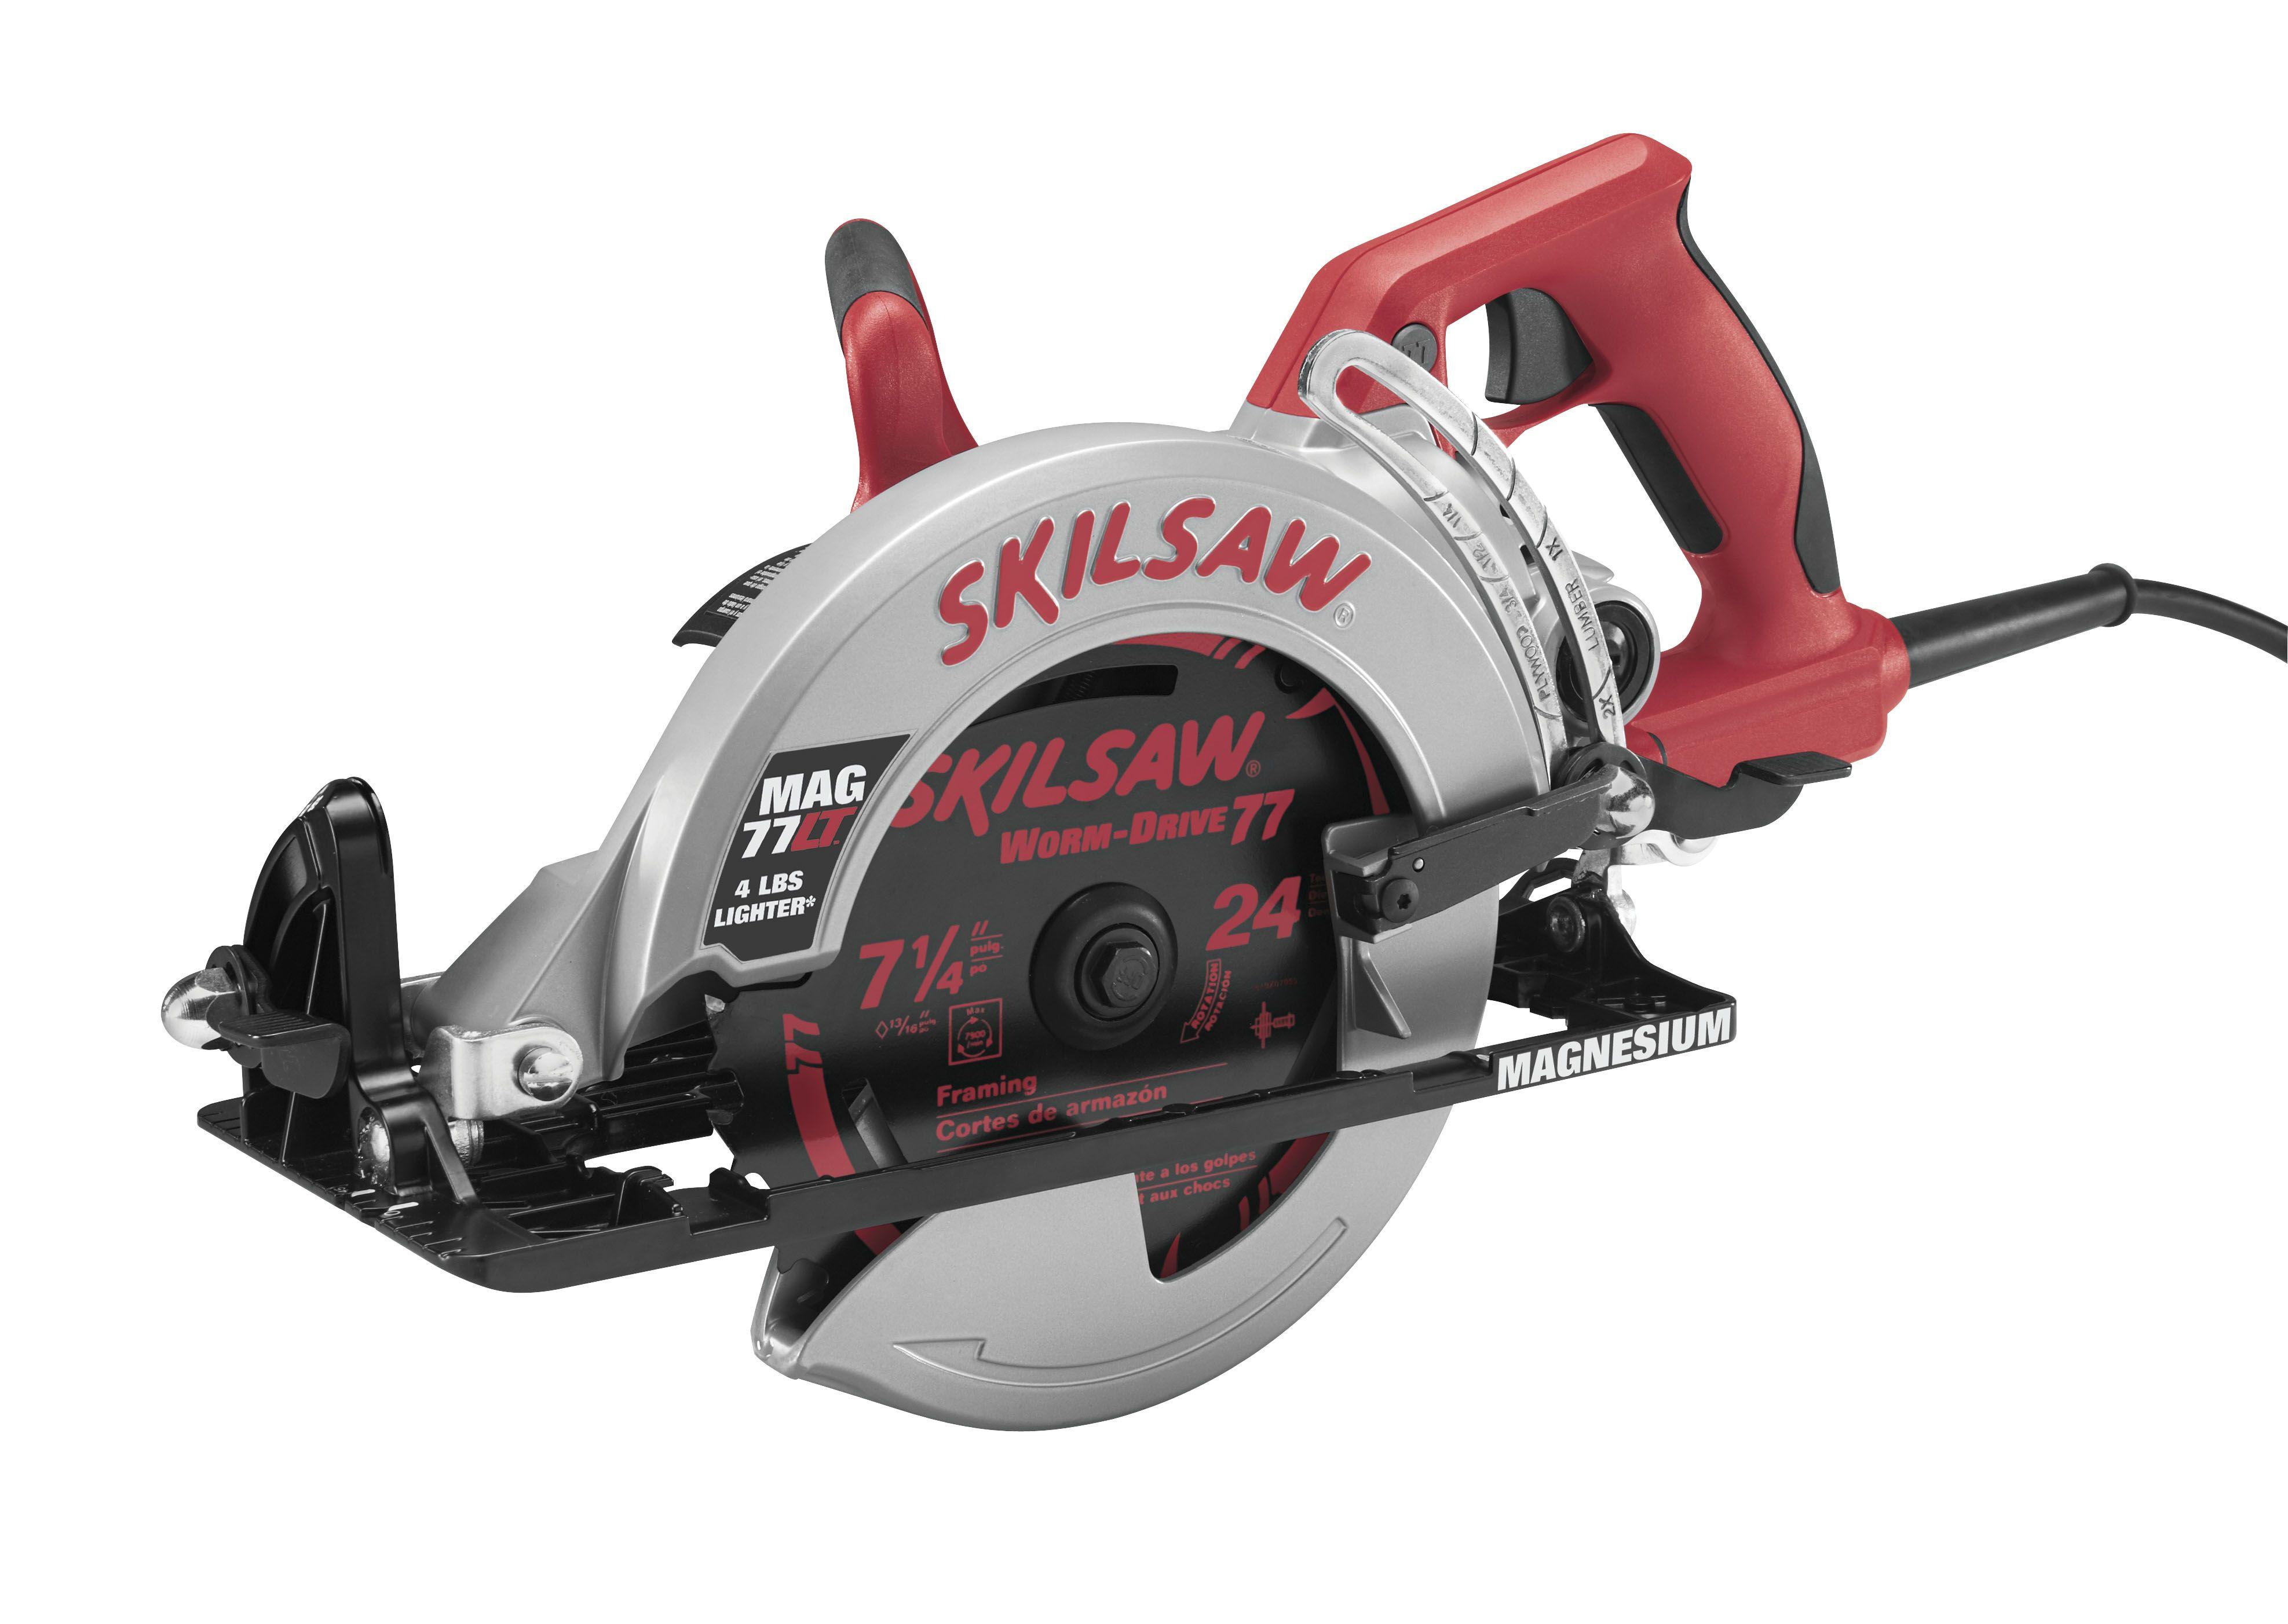 The Skil Saw Mag77lt More Mag Less Weight The World S Lightest Worm Drive Skil Circular Saw Design Elektrisch Gereedschap Gereedschap